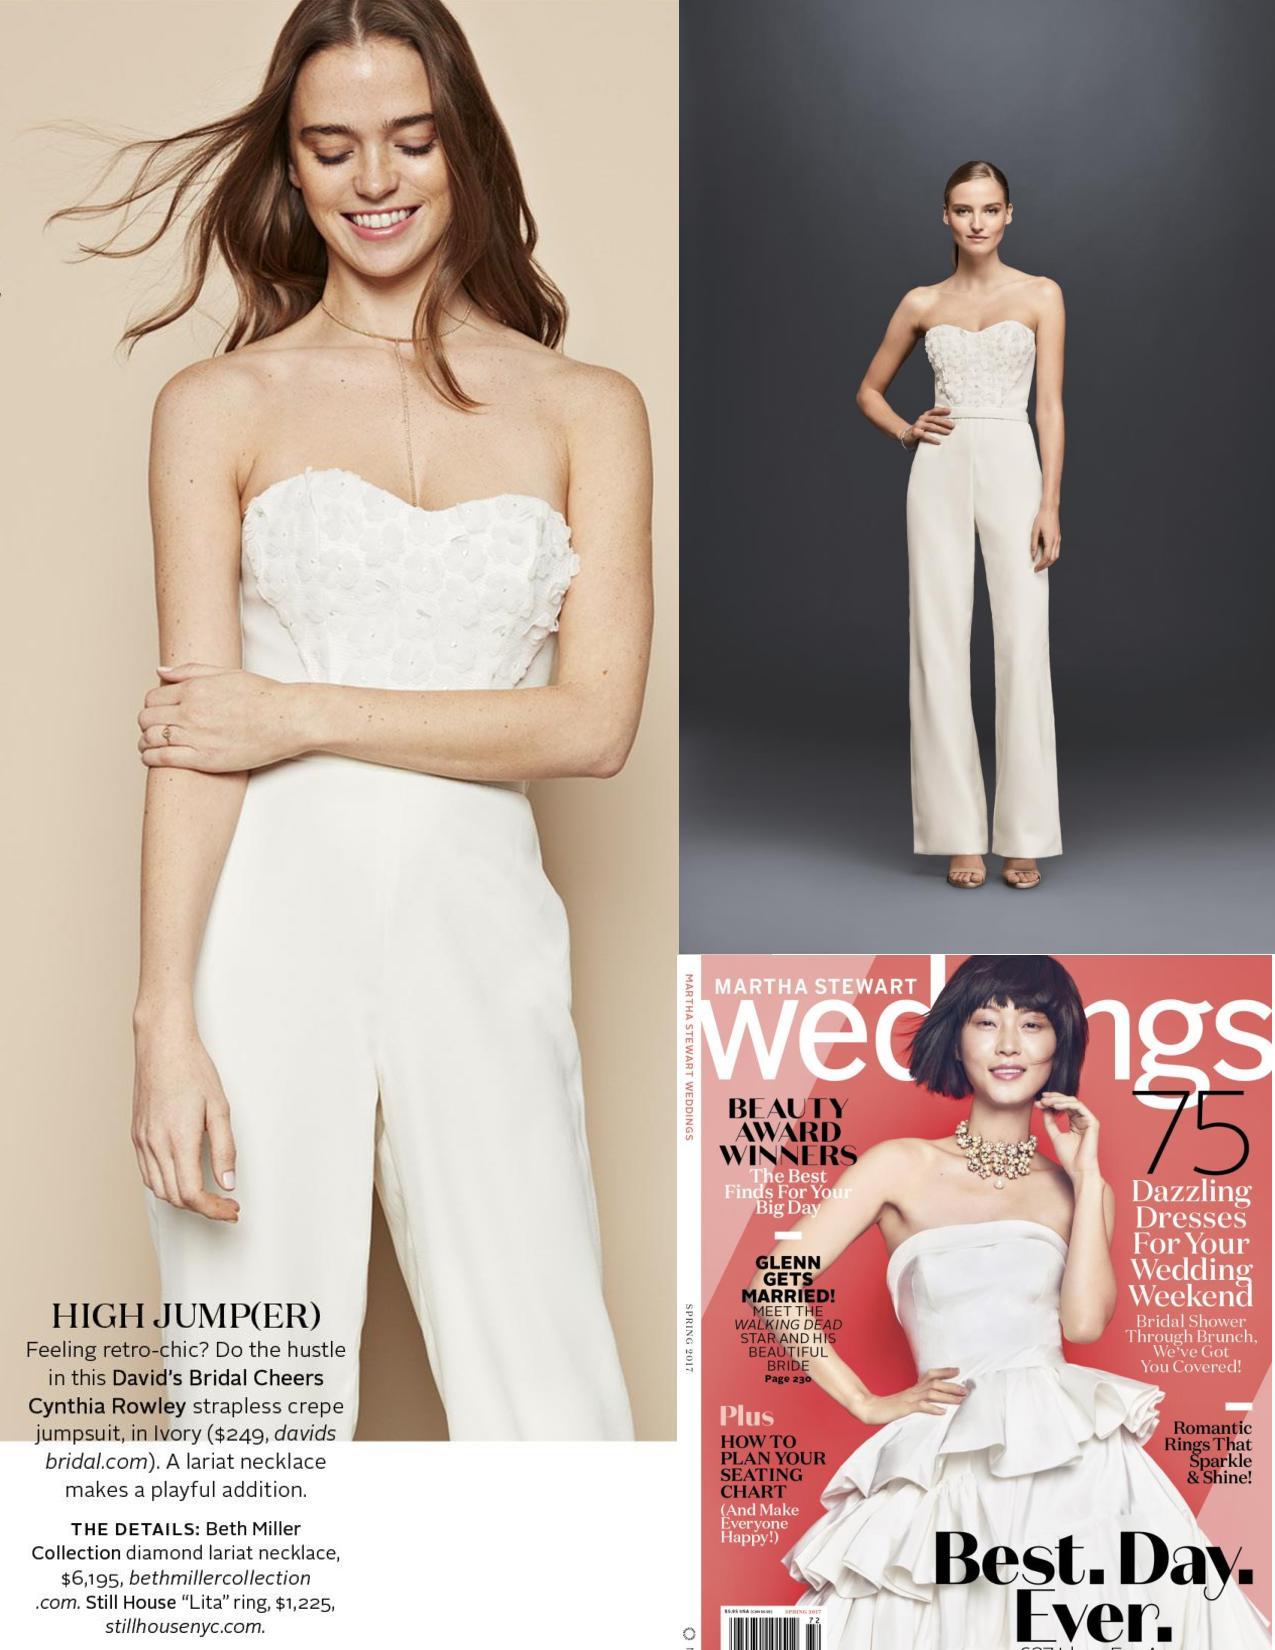 Martha Stewart Weddings clip featuring model in ivory Cheers Cynthia Rowley wedding jumpsuit.